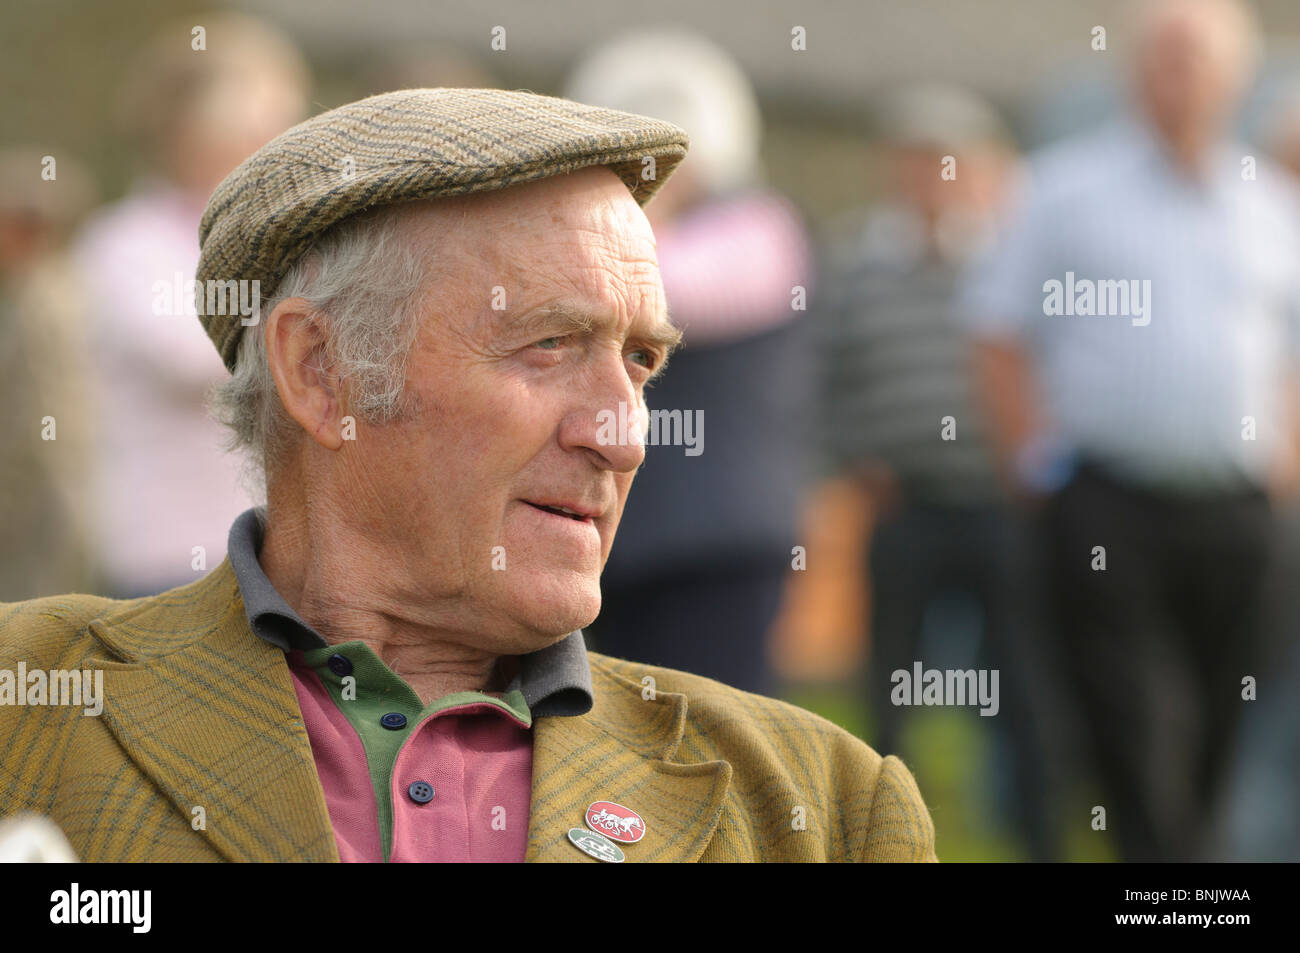 1e7c8fa88408 A farmer wearing a flat cap watching Sheepdog trials on a farm in west  wales UK